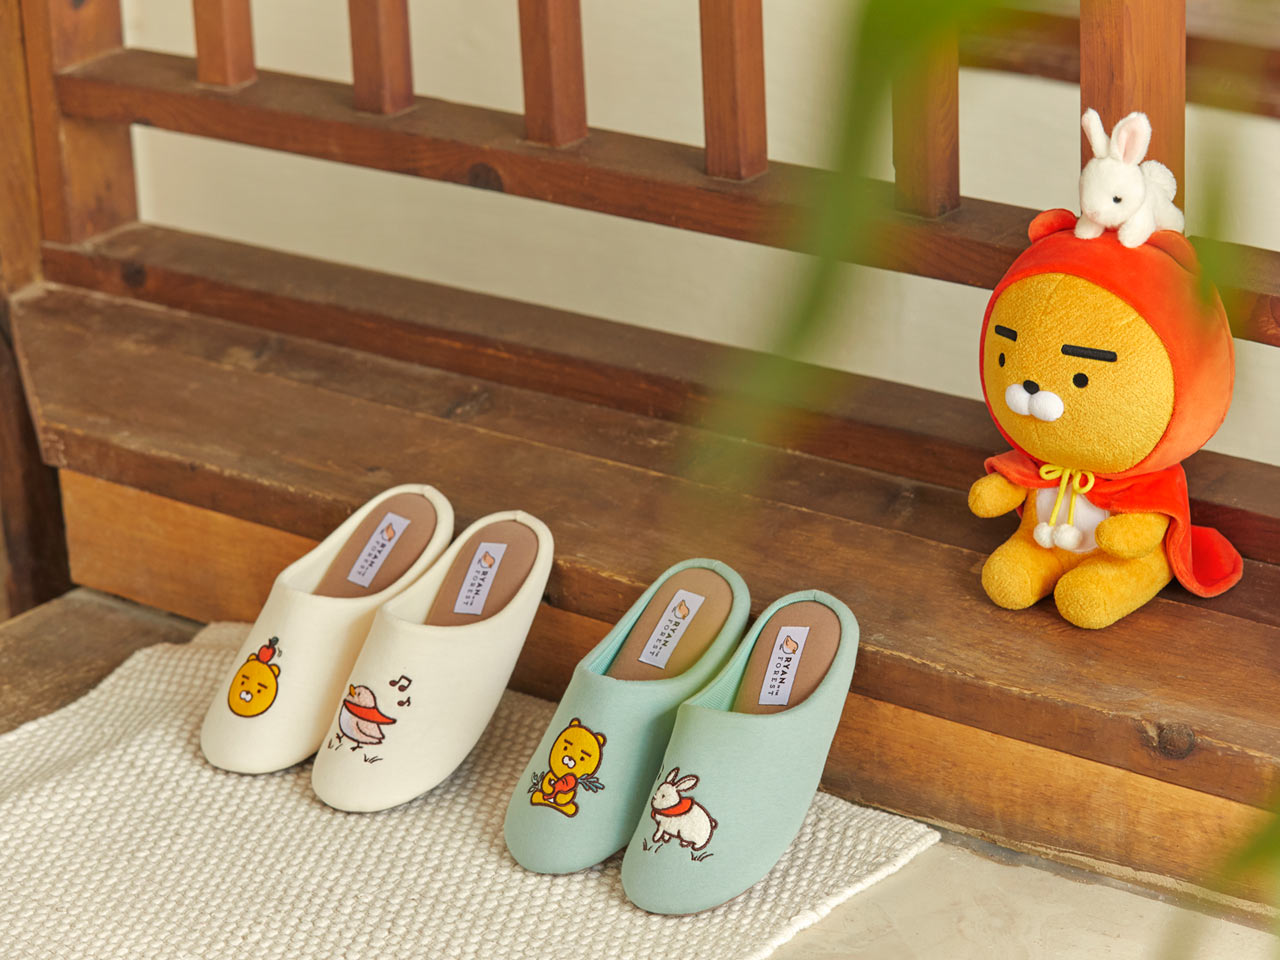 Kakao Friends ryan拖鞋